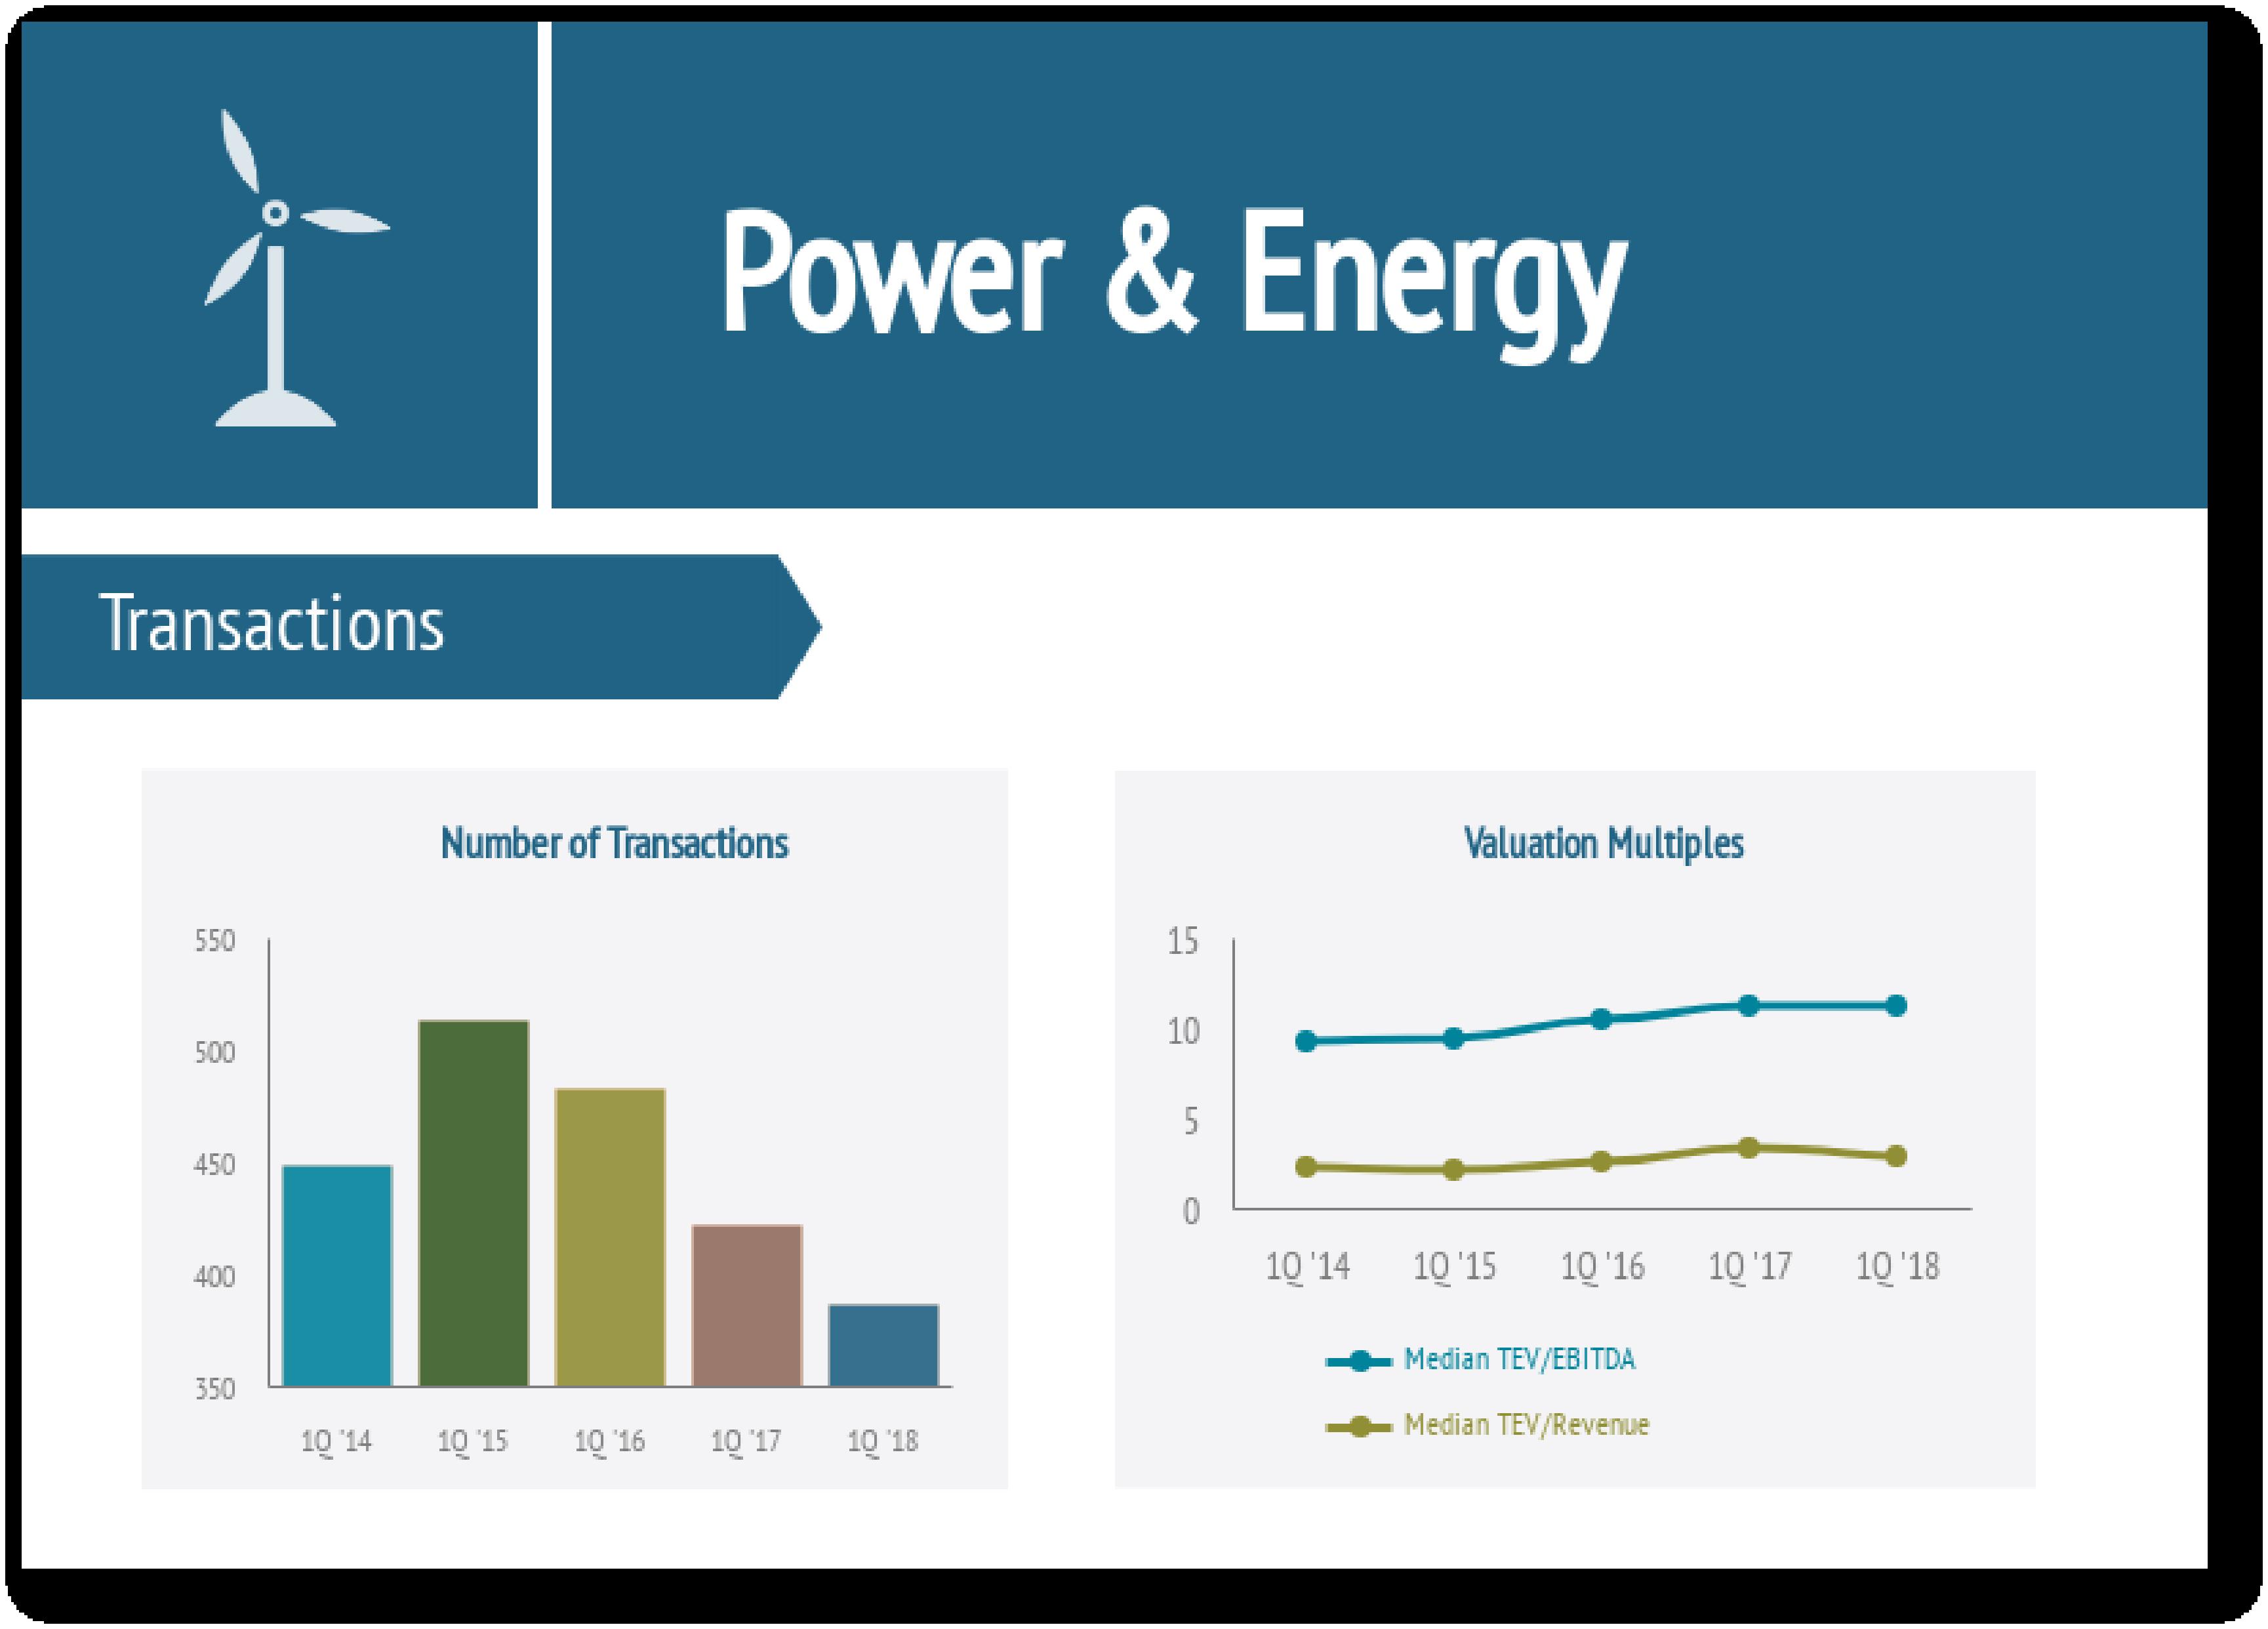 Power & Energy Industry Report